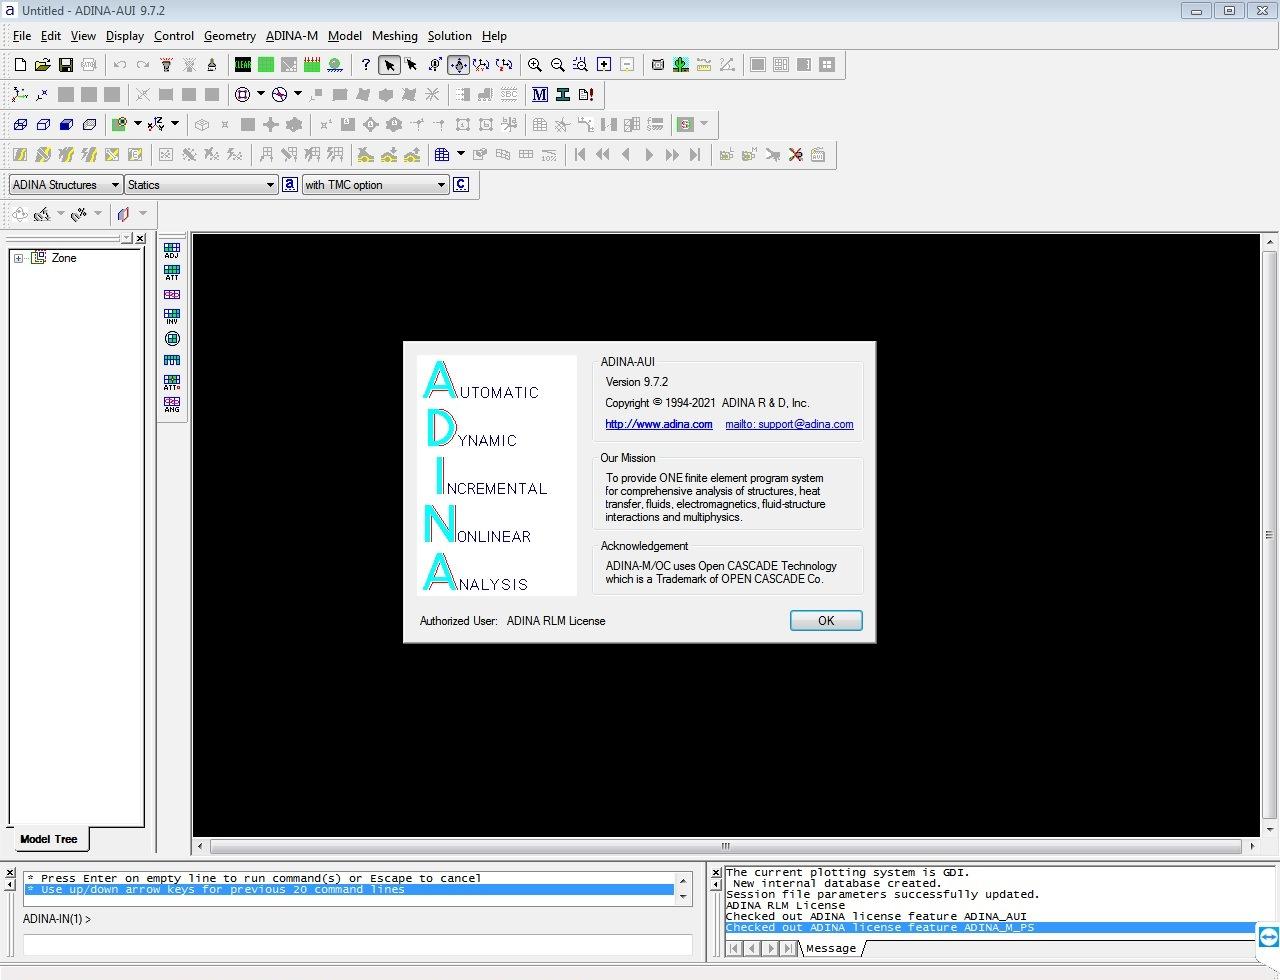 ADINA System 9.7.2 Crack-License Key Free